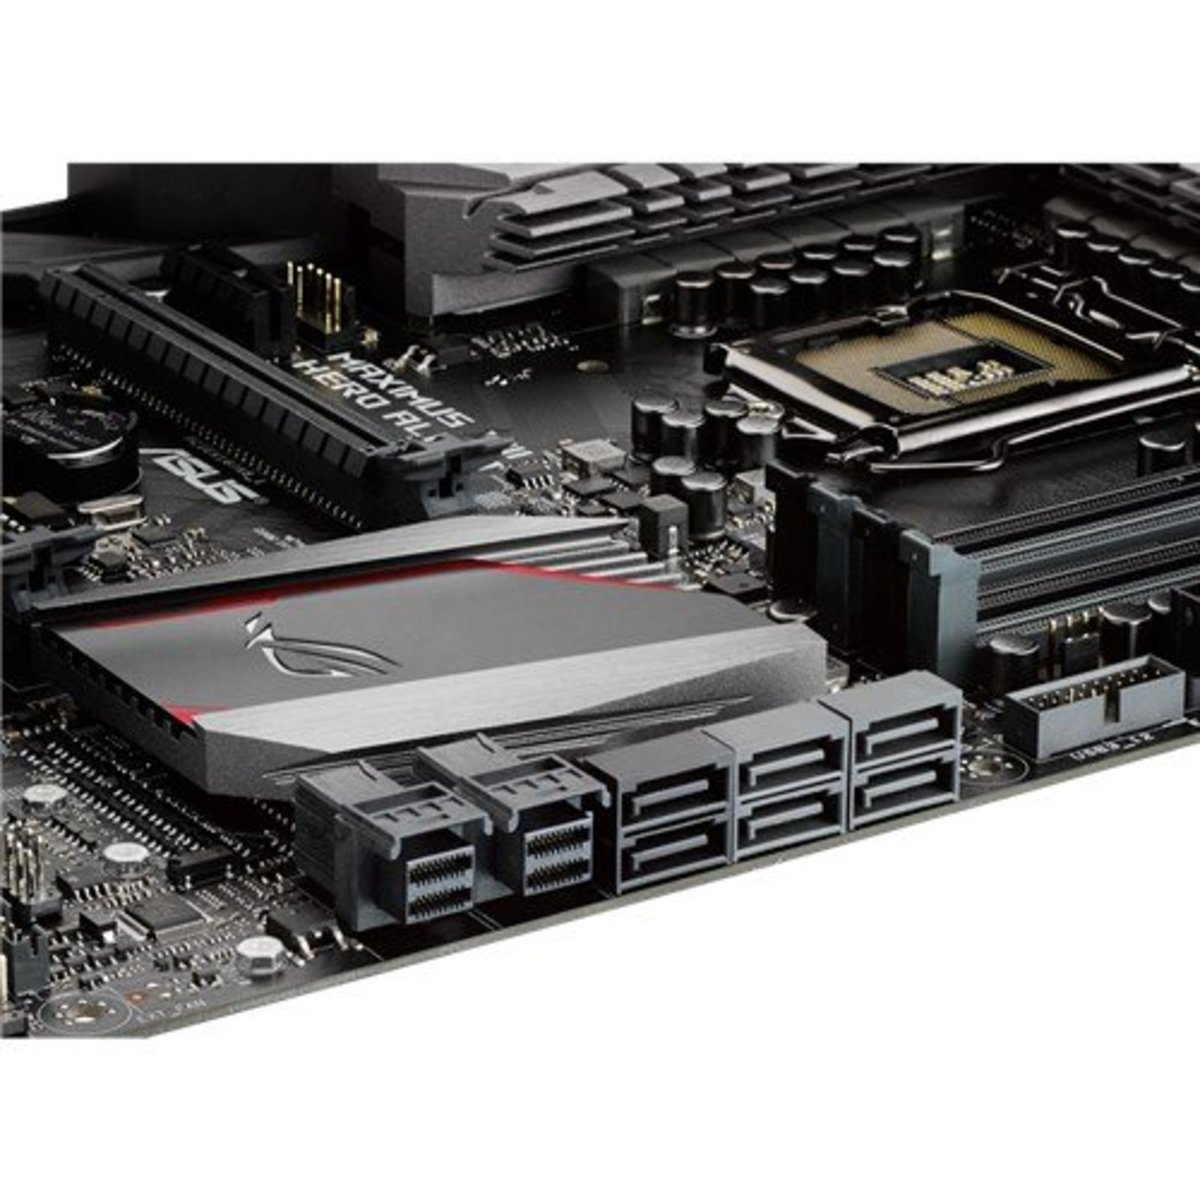 Best Z170 Skylake 1151 PC Gaming Motherboards